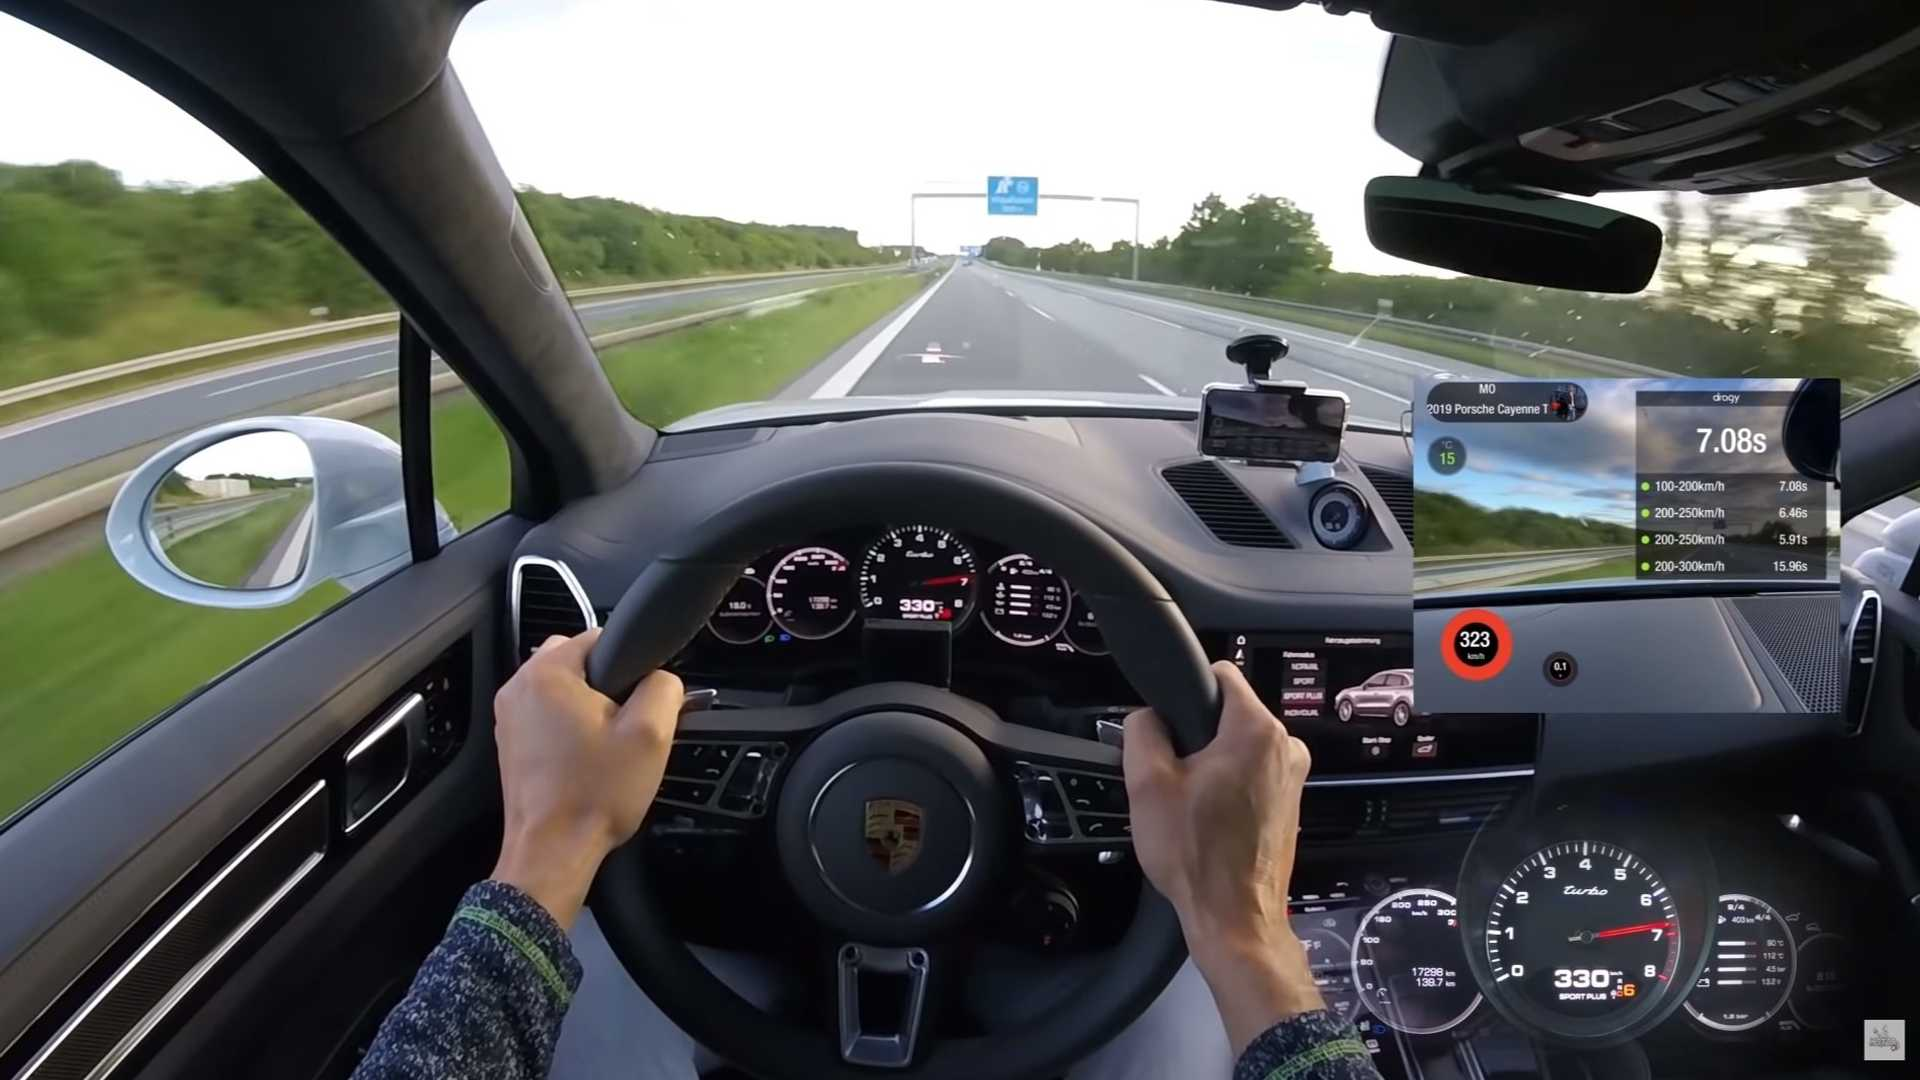 962-Horsepower Porsche Cayenne Turbo Hits 207 MPH On The Autobahn